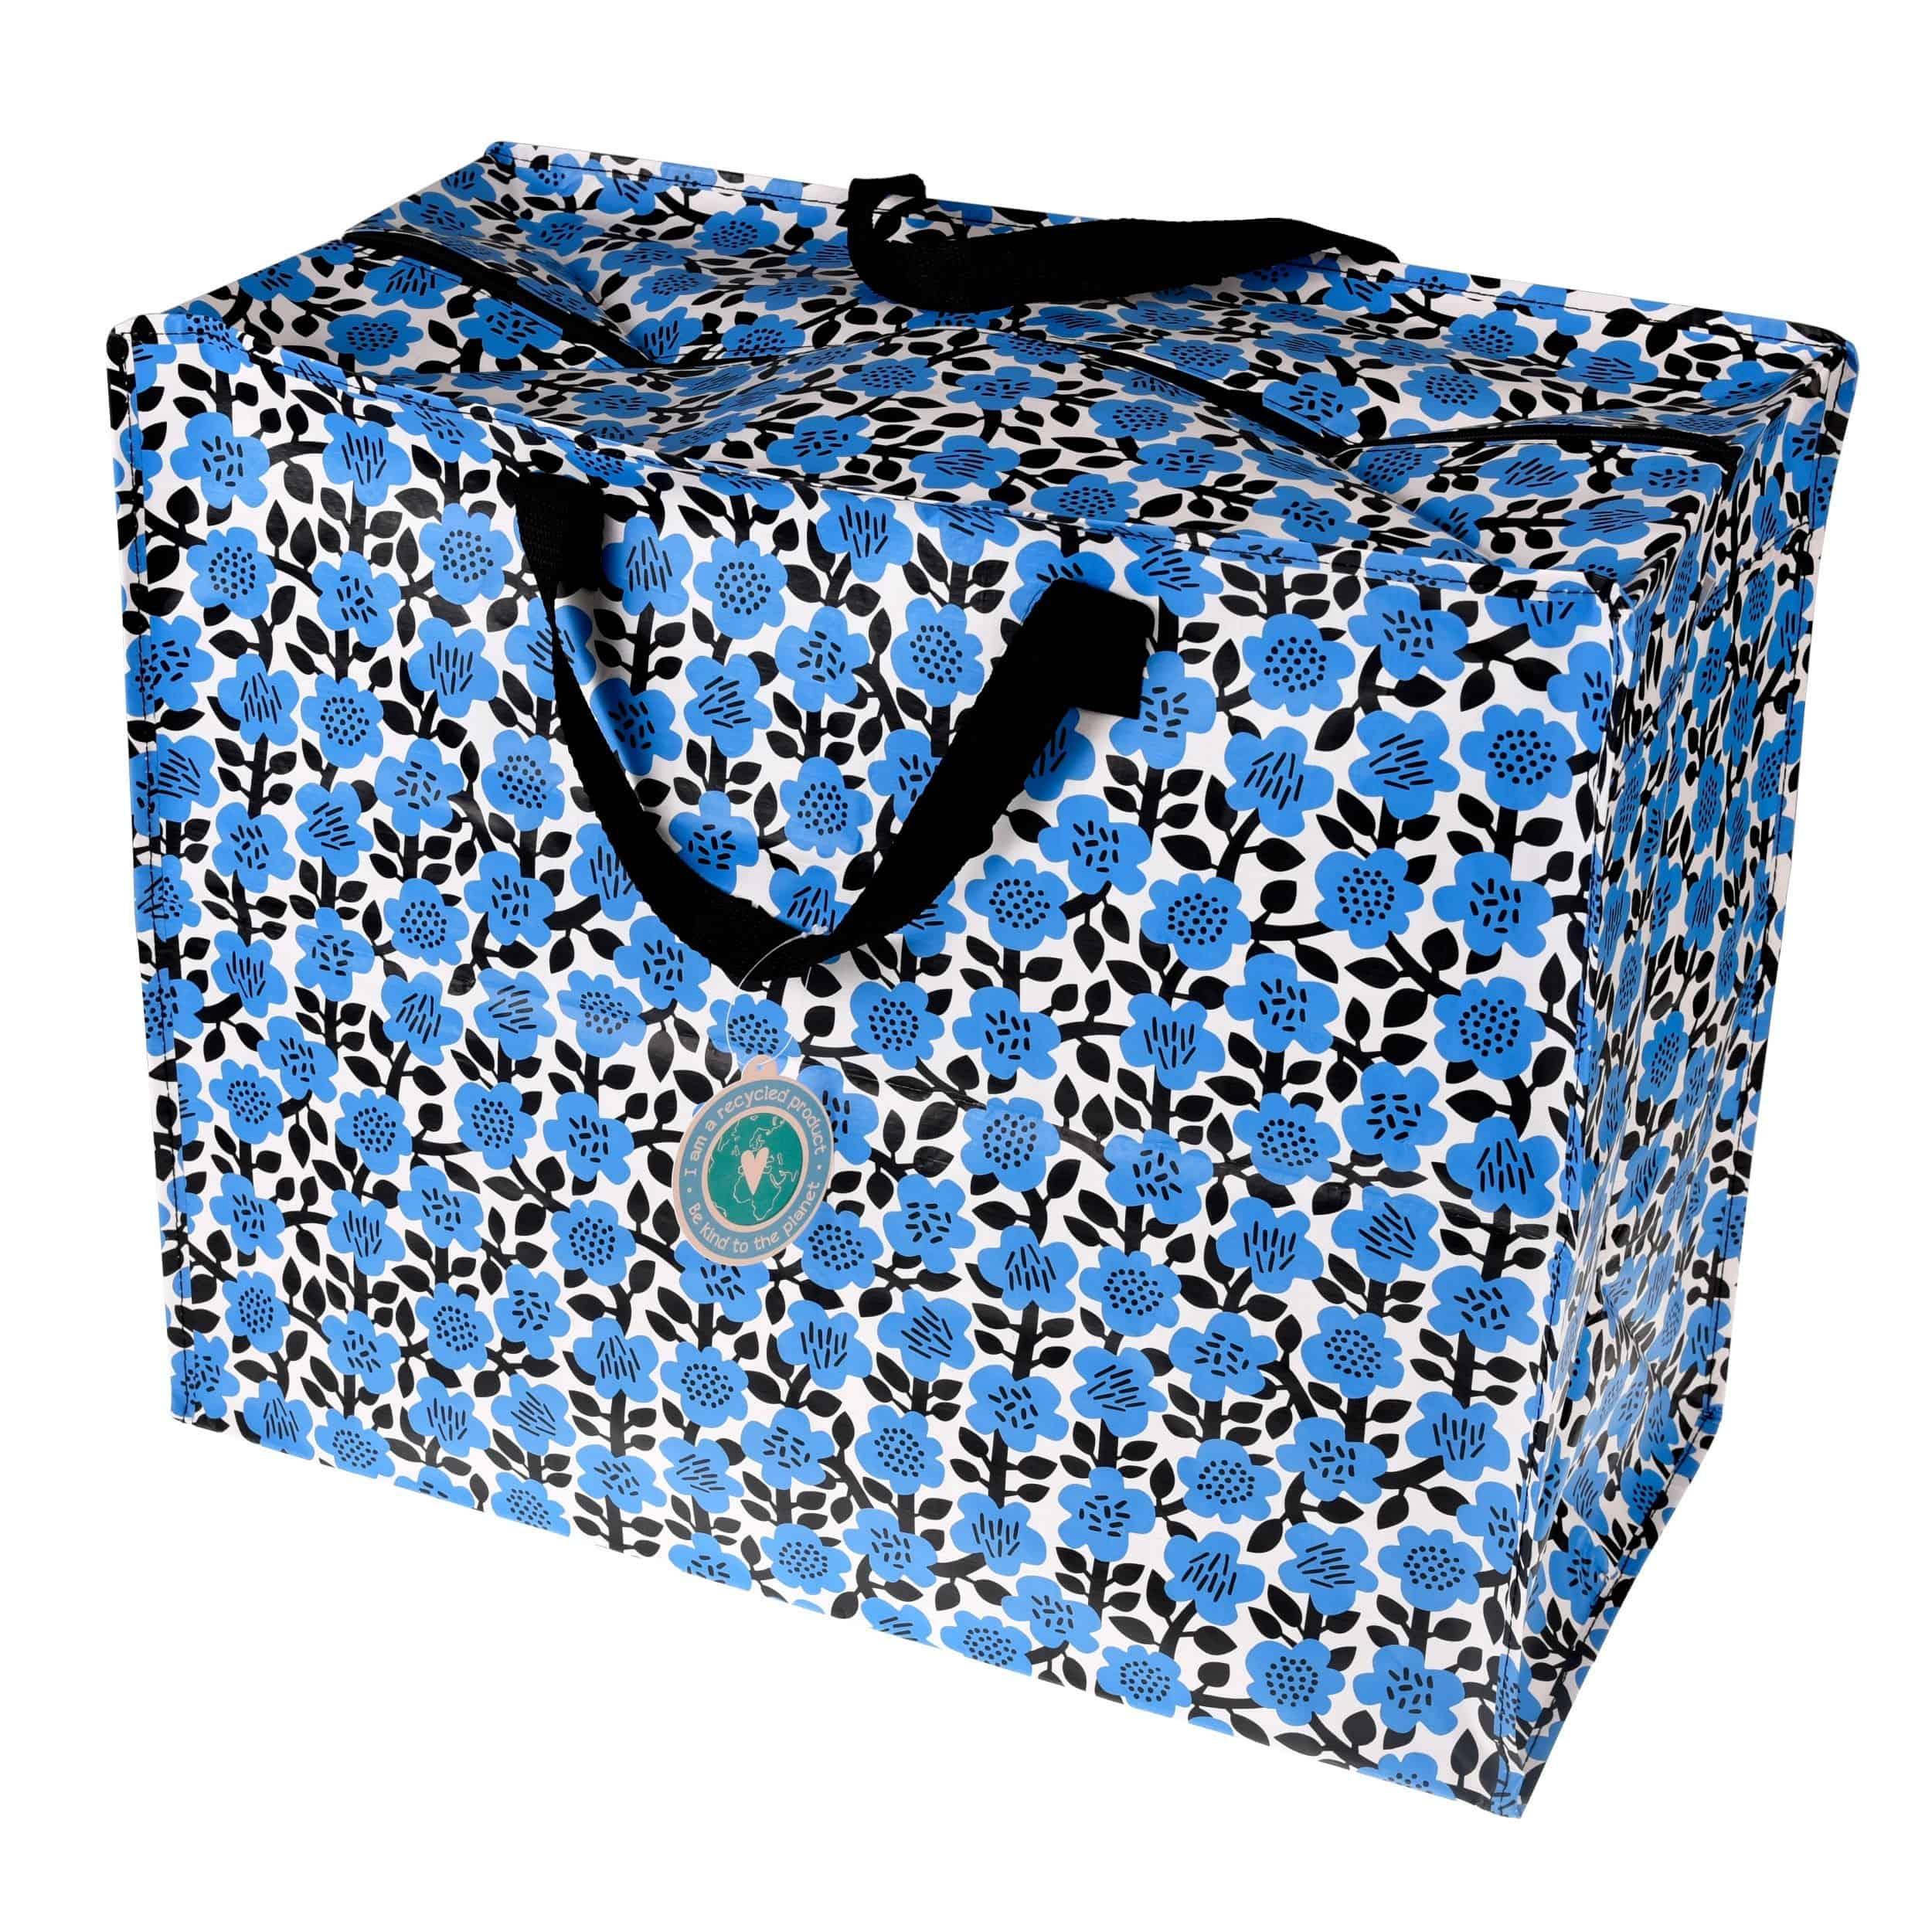 astrid-flower-jumbo-storage-bag-27903  sc 1 st  Jeremyu0027s Home Store & Astrid Flower Jumbo Storage Bag - Jeremyu0027s Home StoreJeremyu0027s Home Store